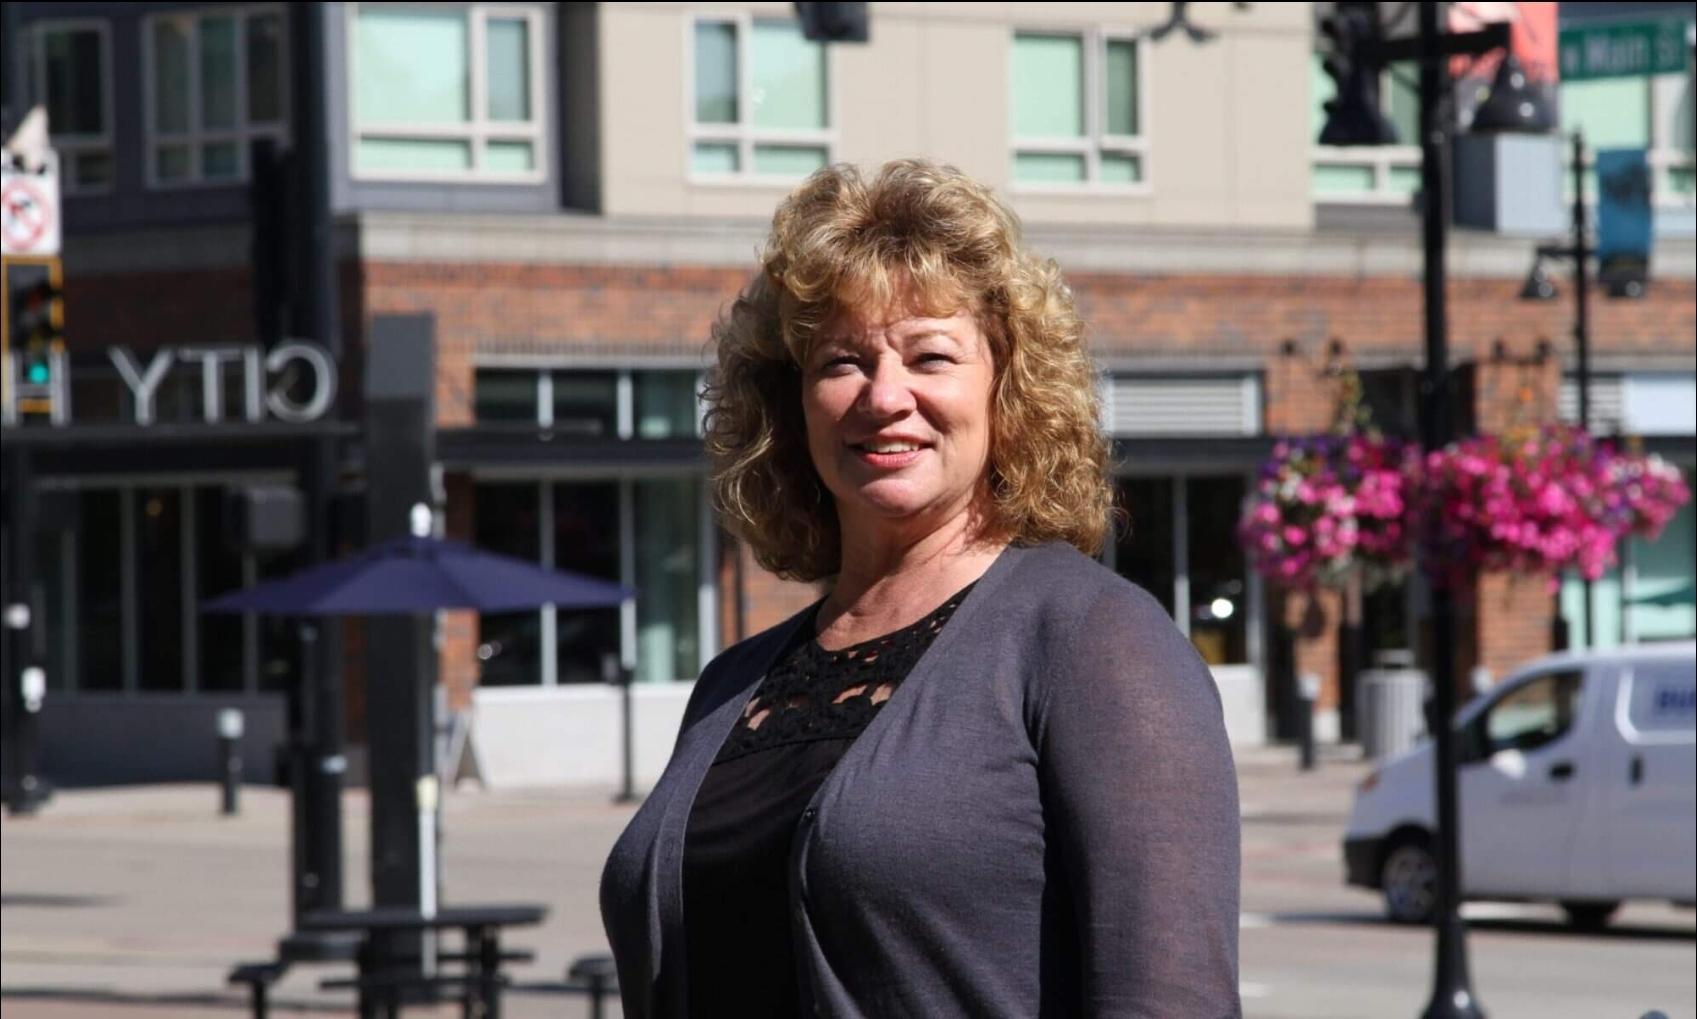 Auburn Mayor Nancy Backus stands in downtown Auburn on a sunny day